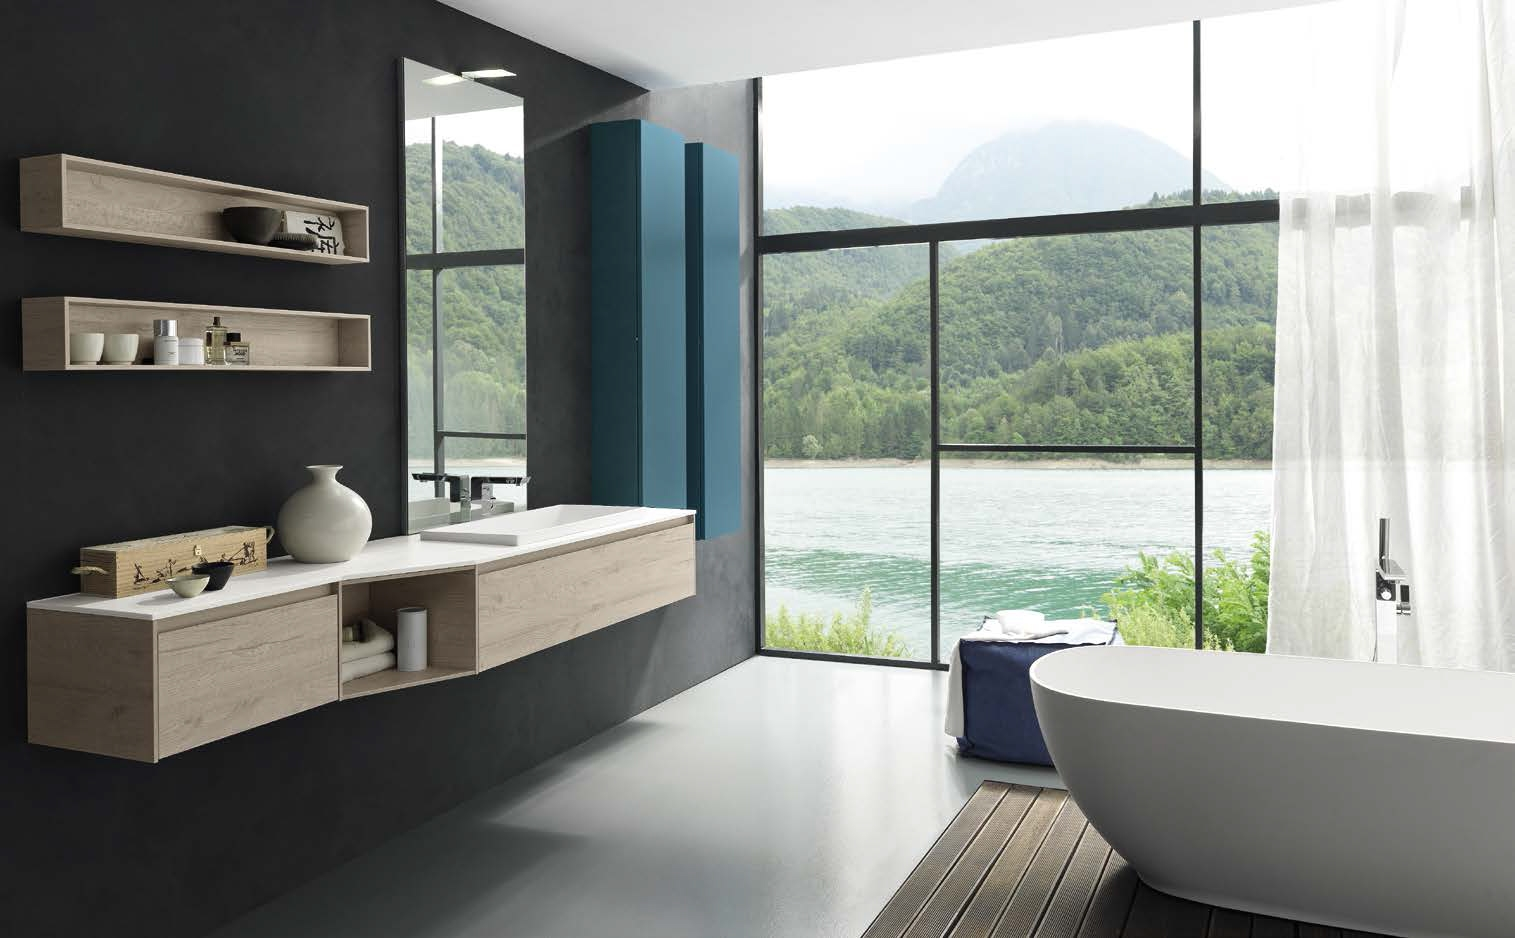 Meuble et vasque salle de bain pas cher valdiz for Meuble salle de bain pas cher but